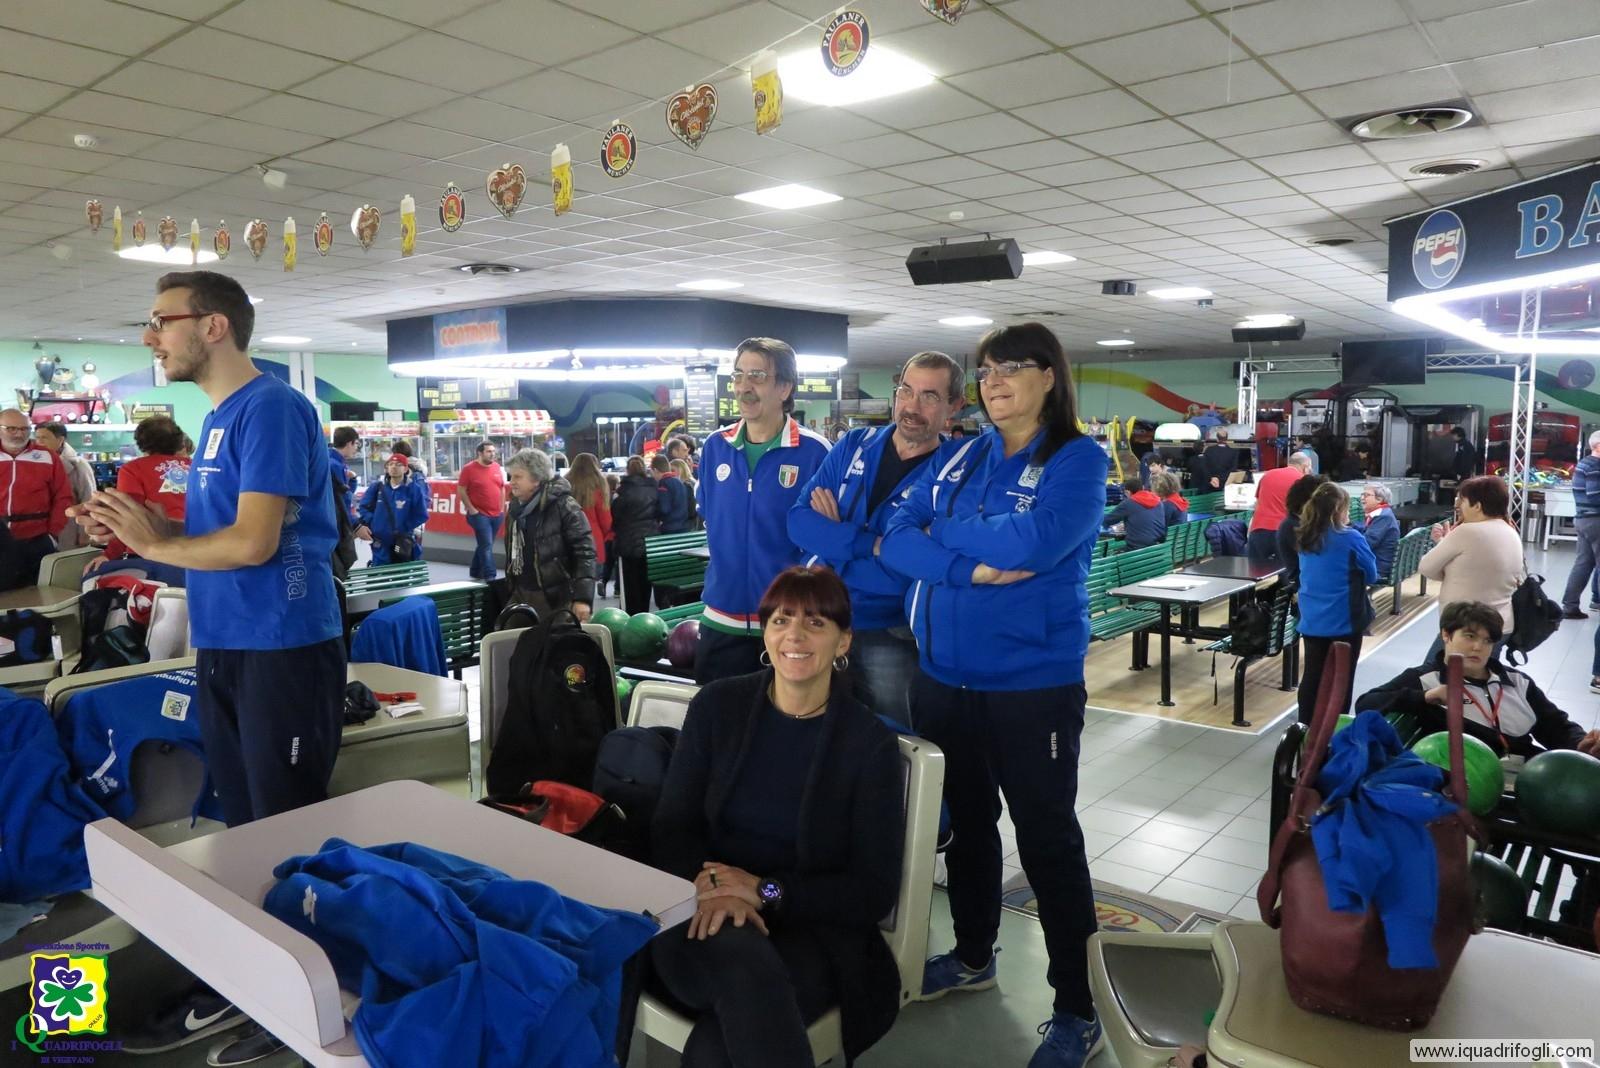 Bowling Nerviano 2019 - Regionali - 126